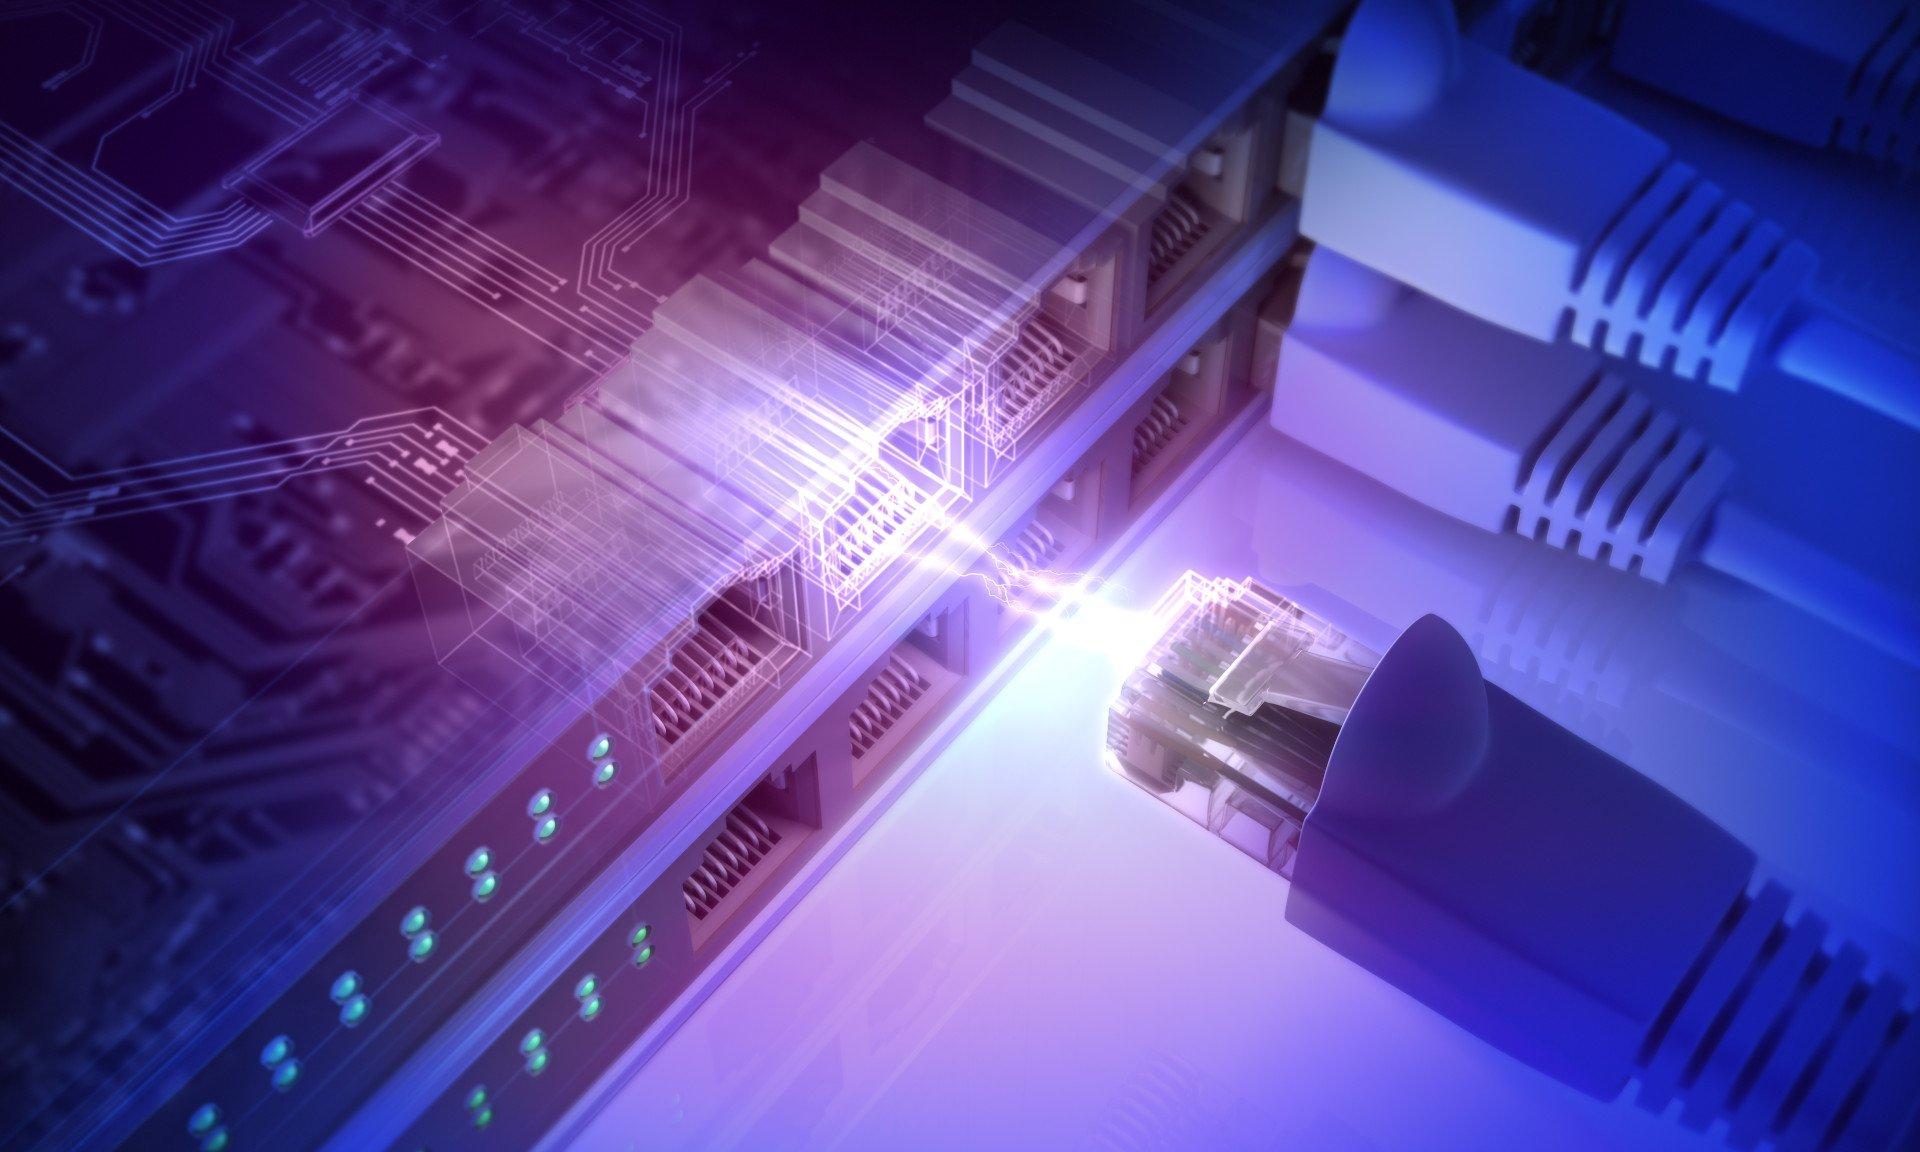 lighting-up-server-5g-upf-blog